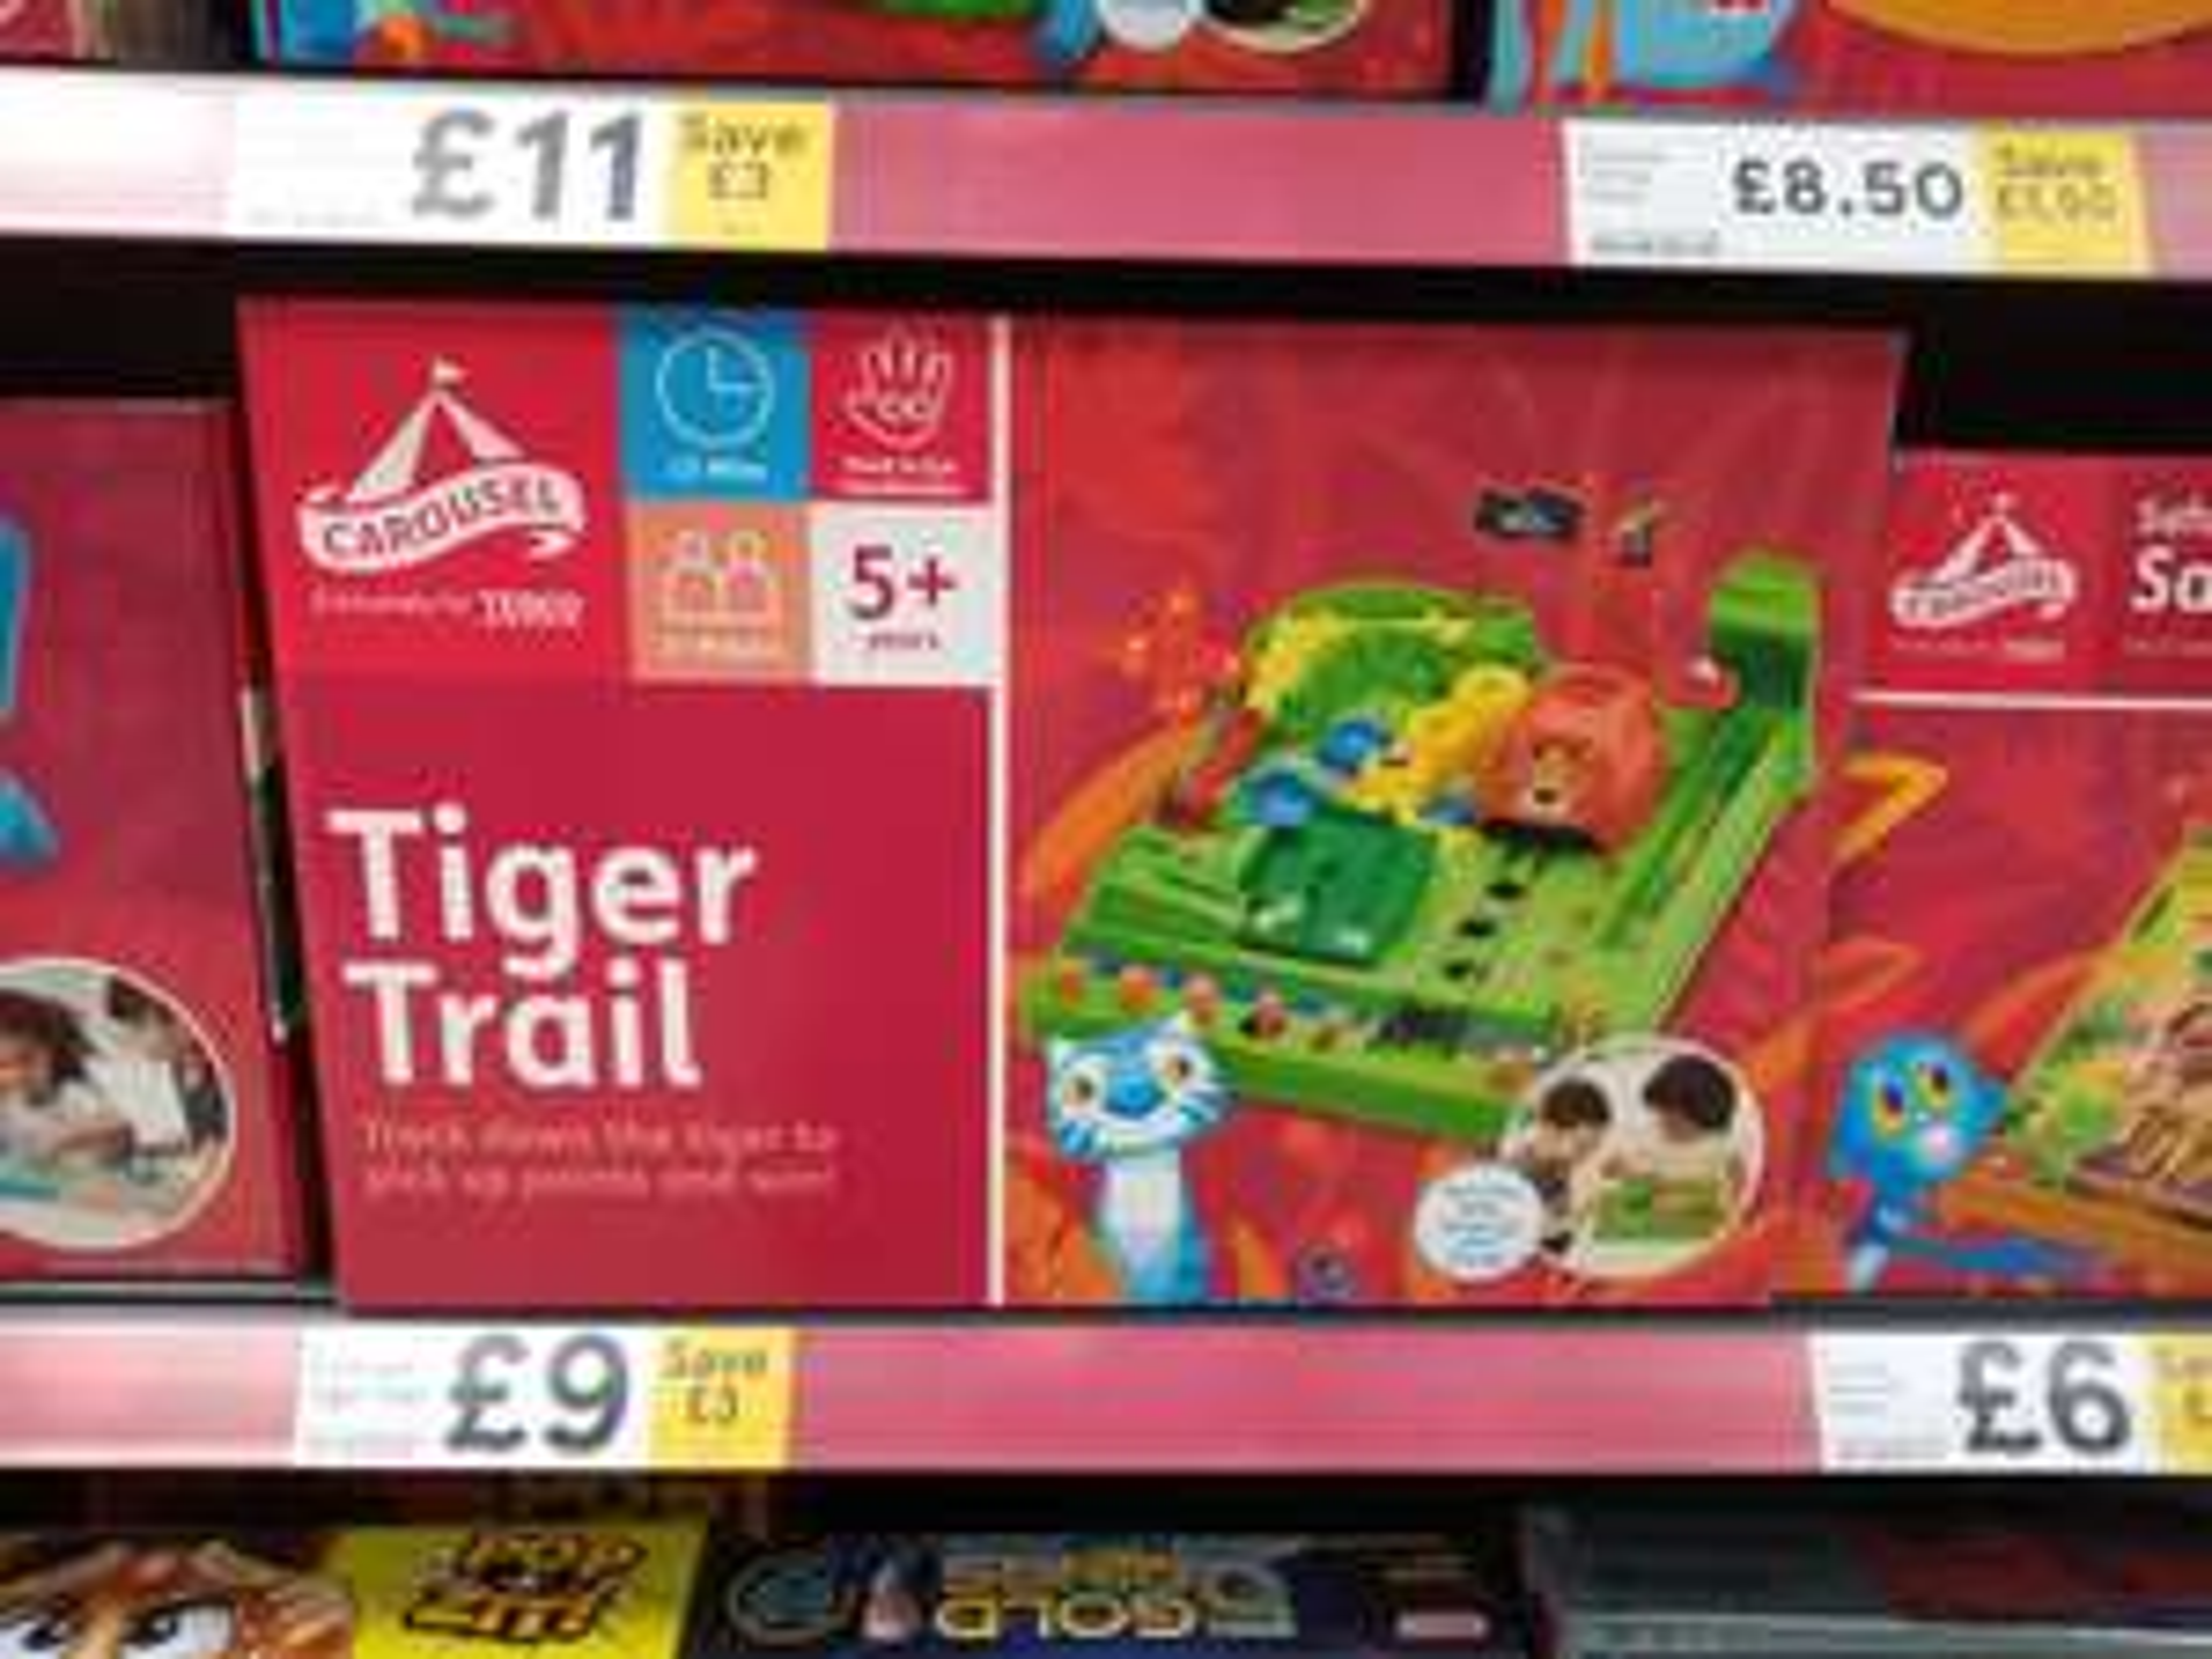 Tiger Trail - Tesco's Own-Brand Equiv. of Screwball Scramble | £9 (Was £12) Instore @ Tesco Extra vs. £15.99 @ Amazon for Screwball Scramble